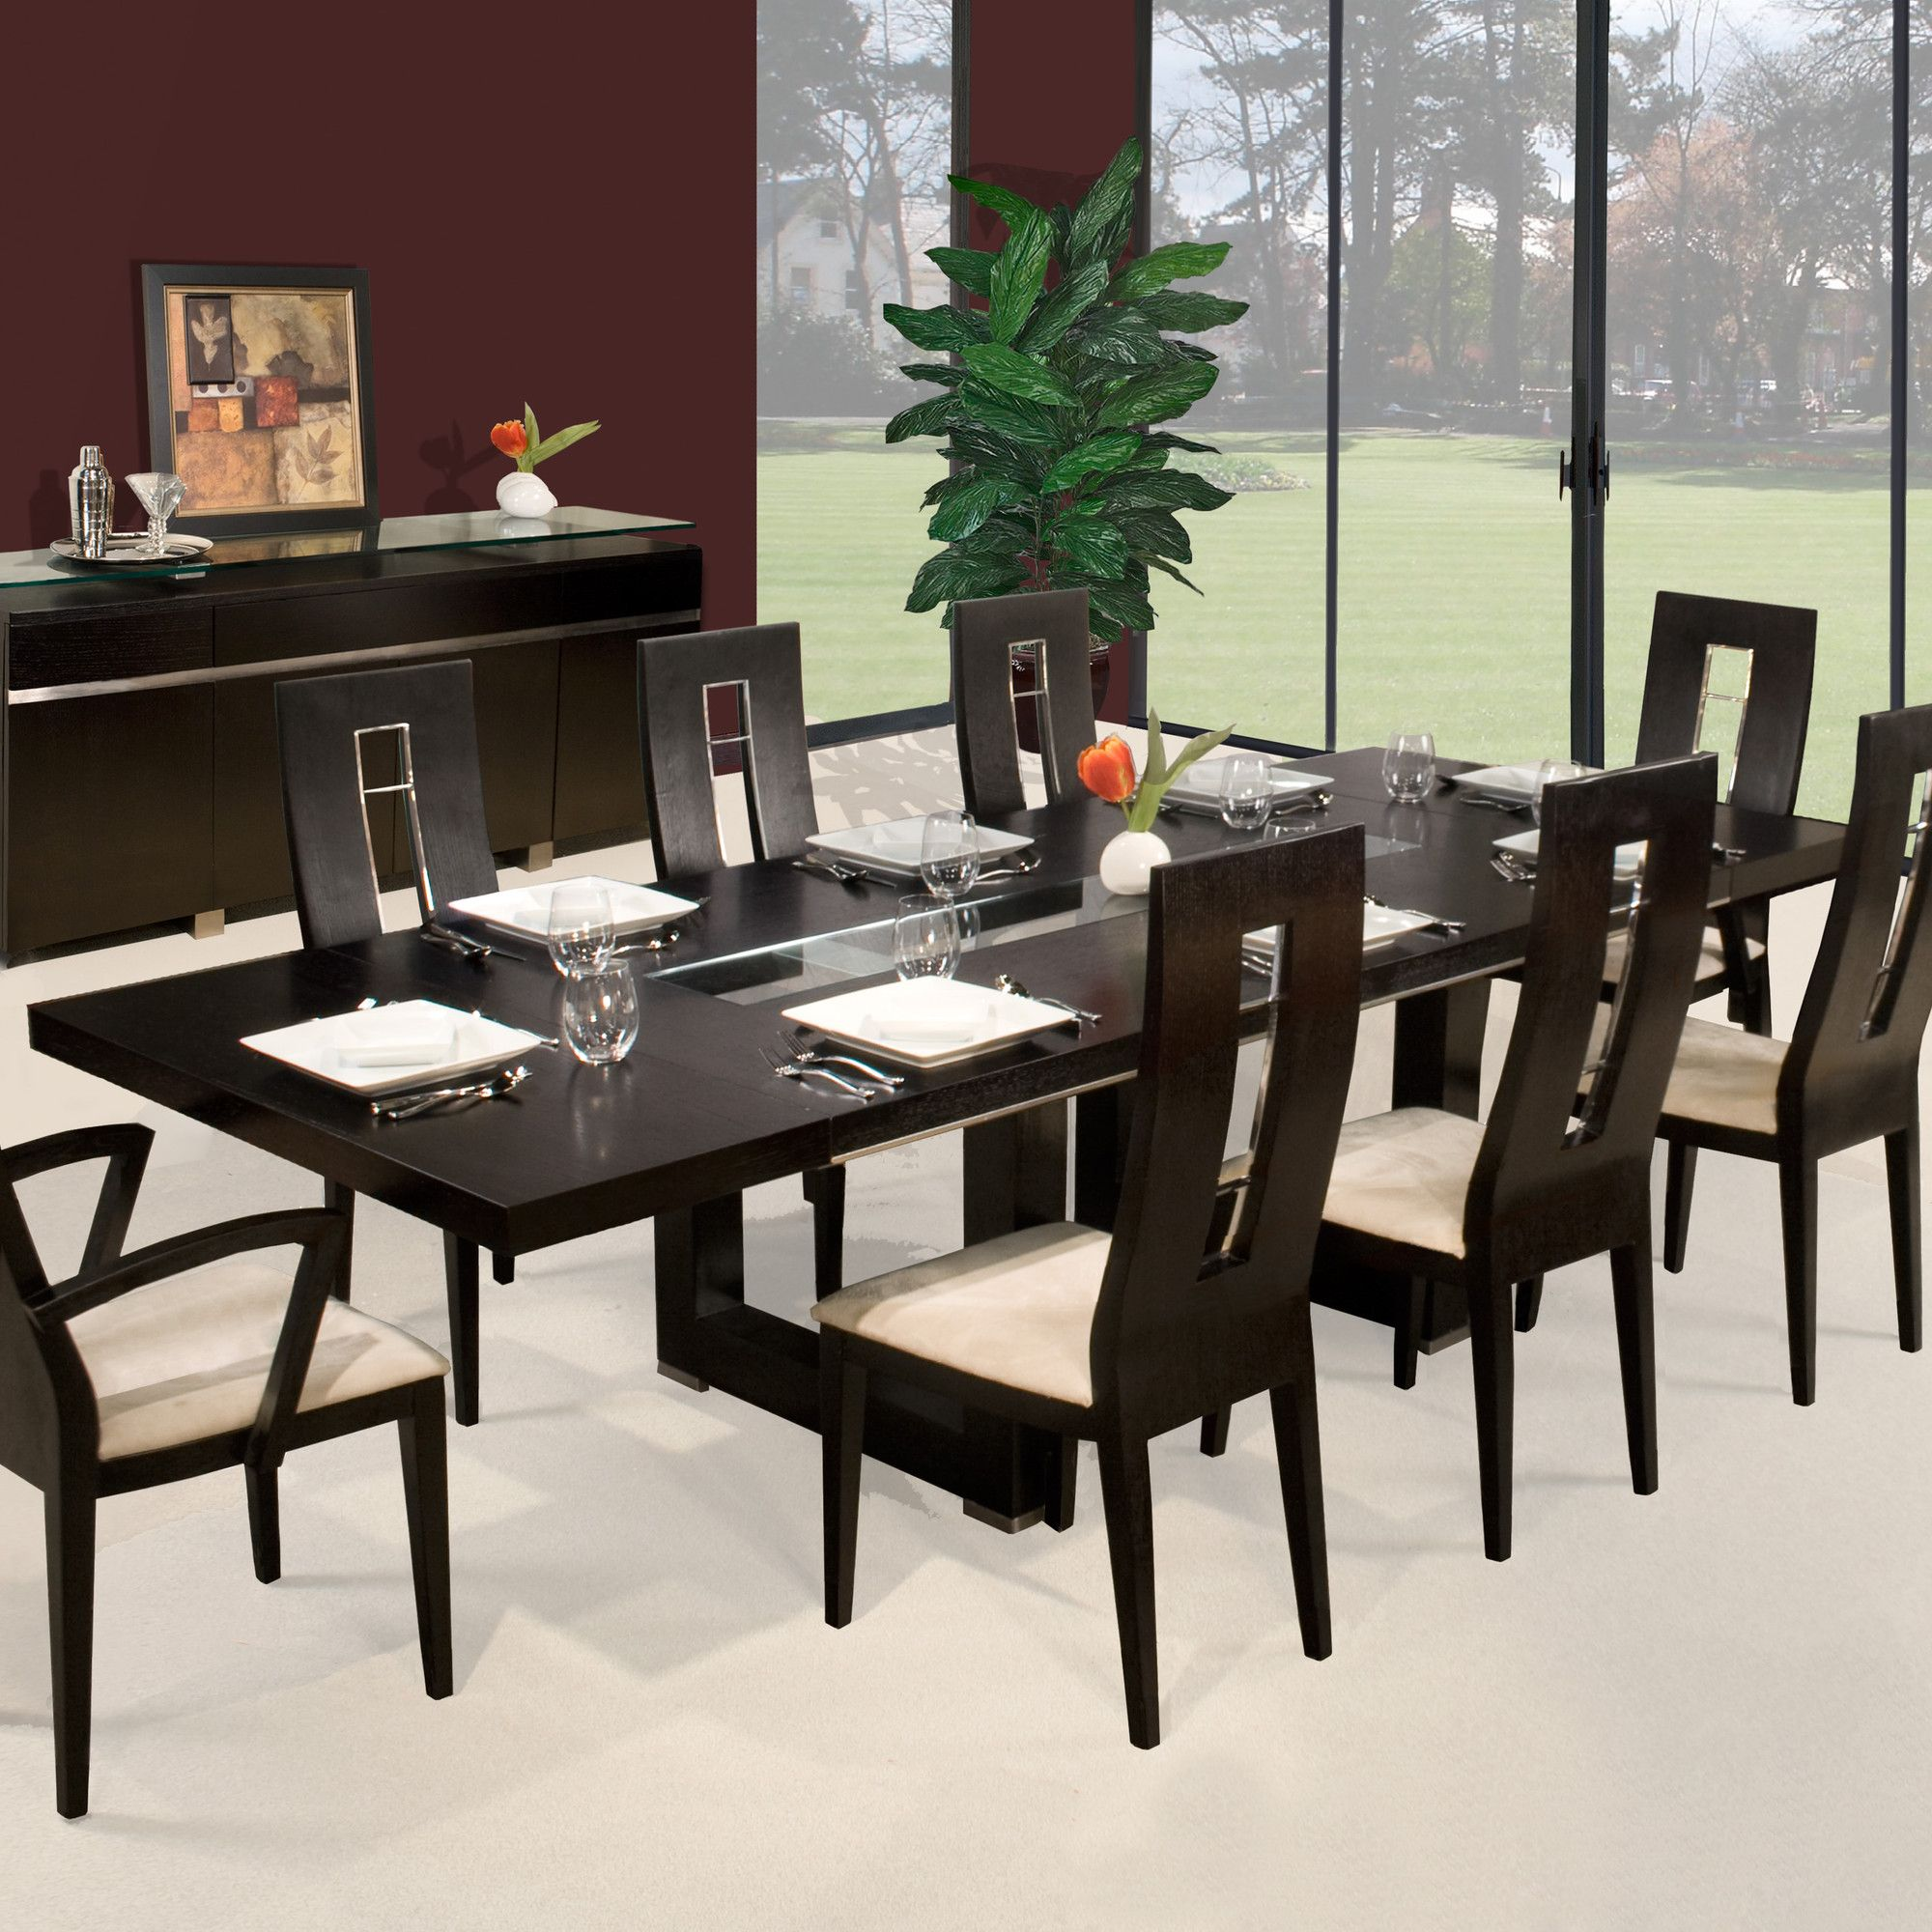 sharelle furnishings novo  piece dining set  allmodern  dining  - sharelle furnishings novo  piece dining set  allmodern